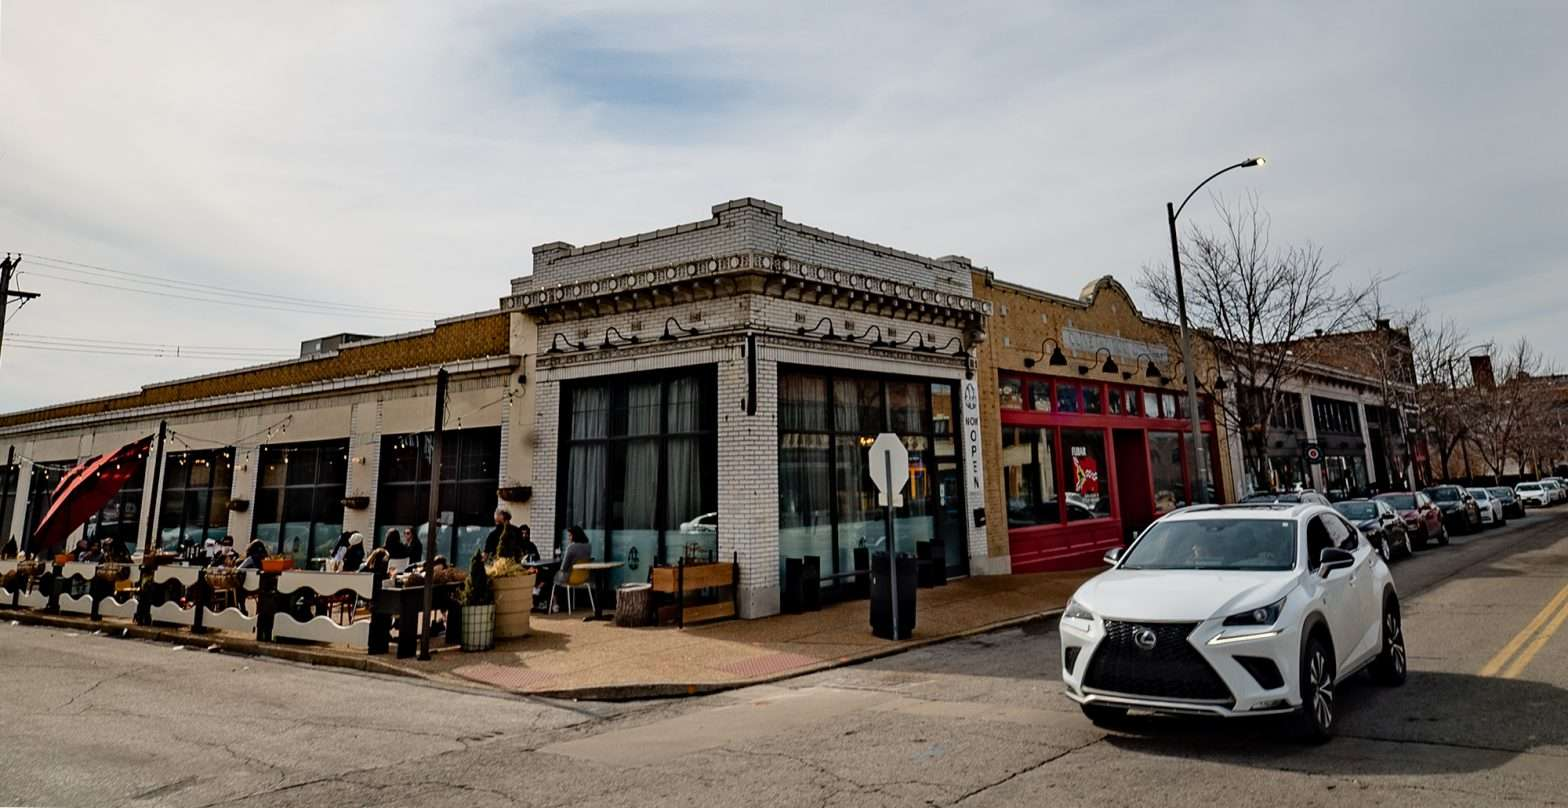 Egg Restaurant Midtown St. Louis in Feb. 2021. credit craig currie